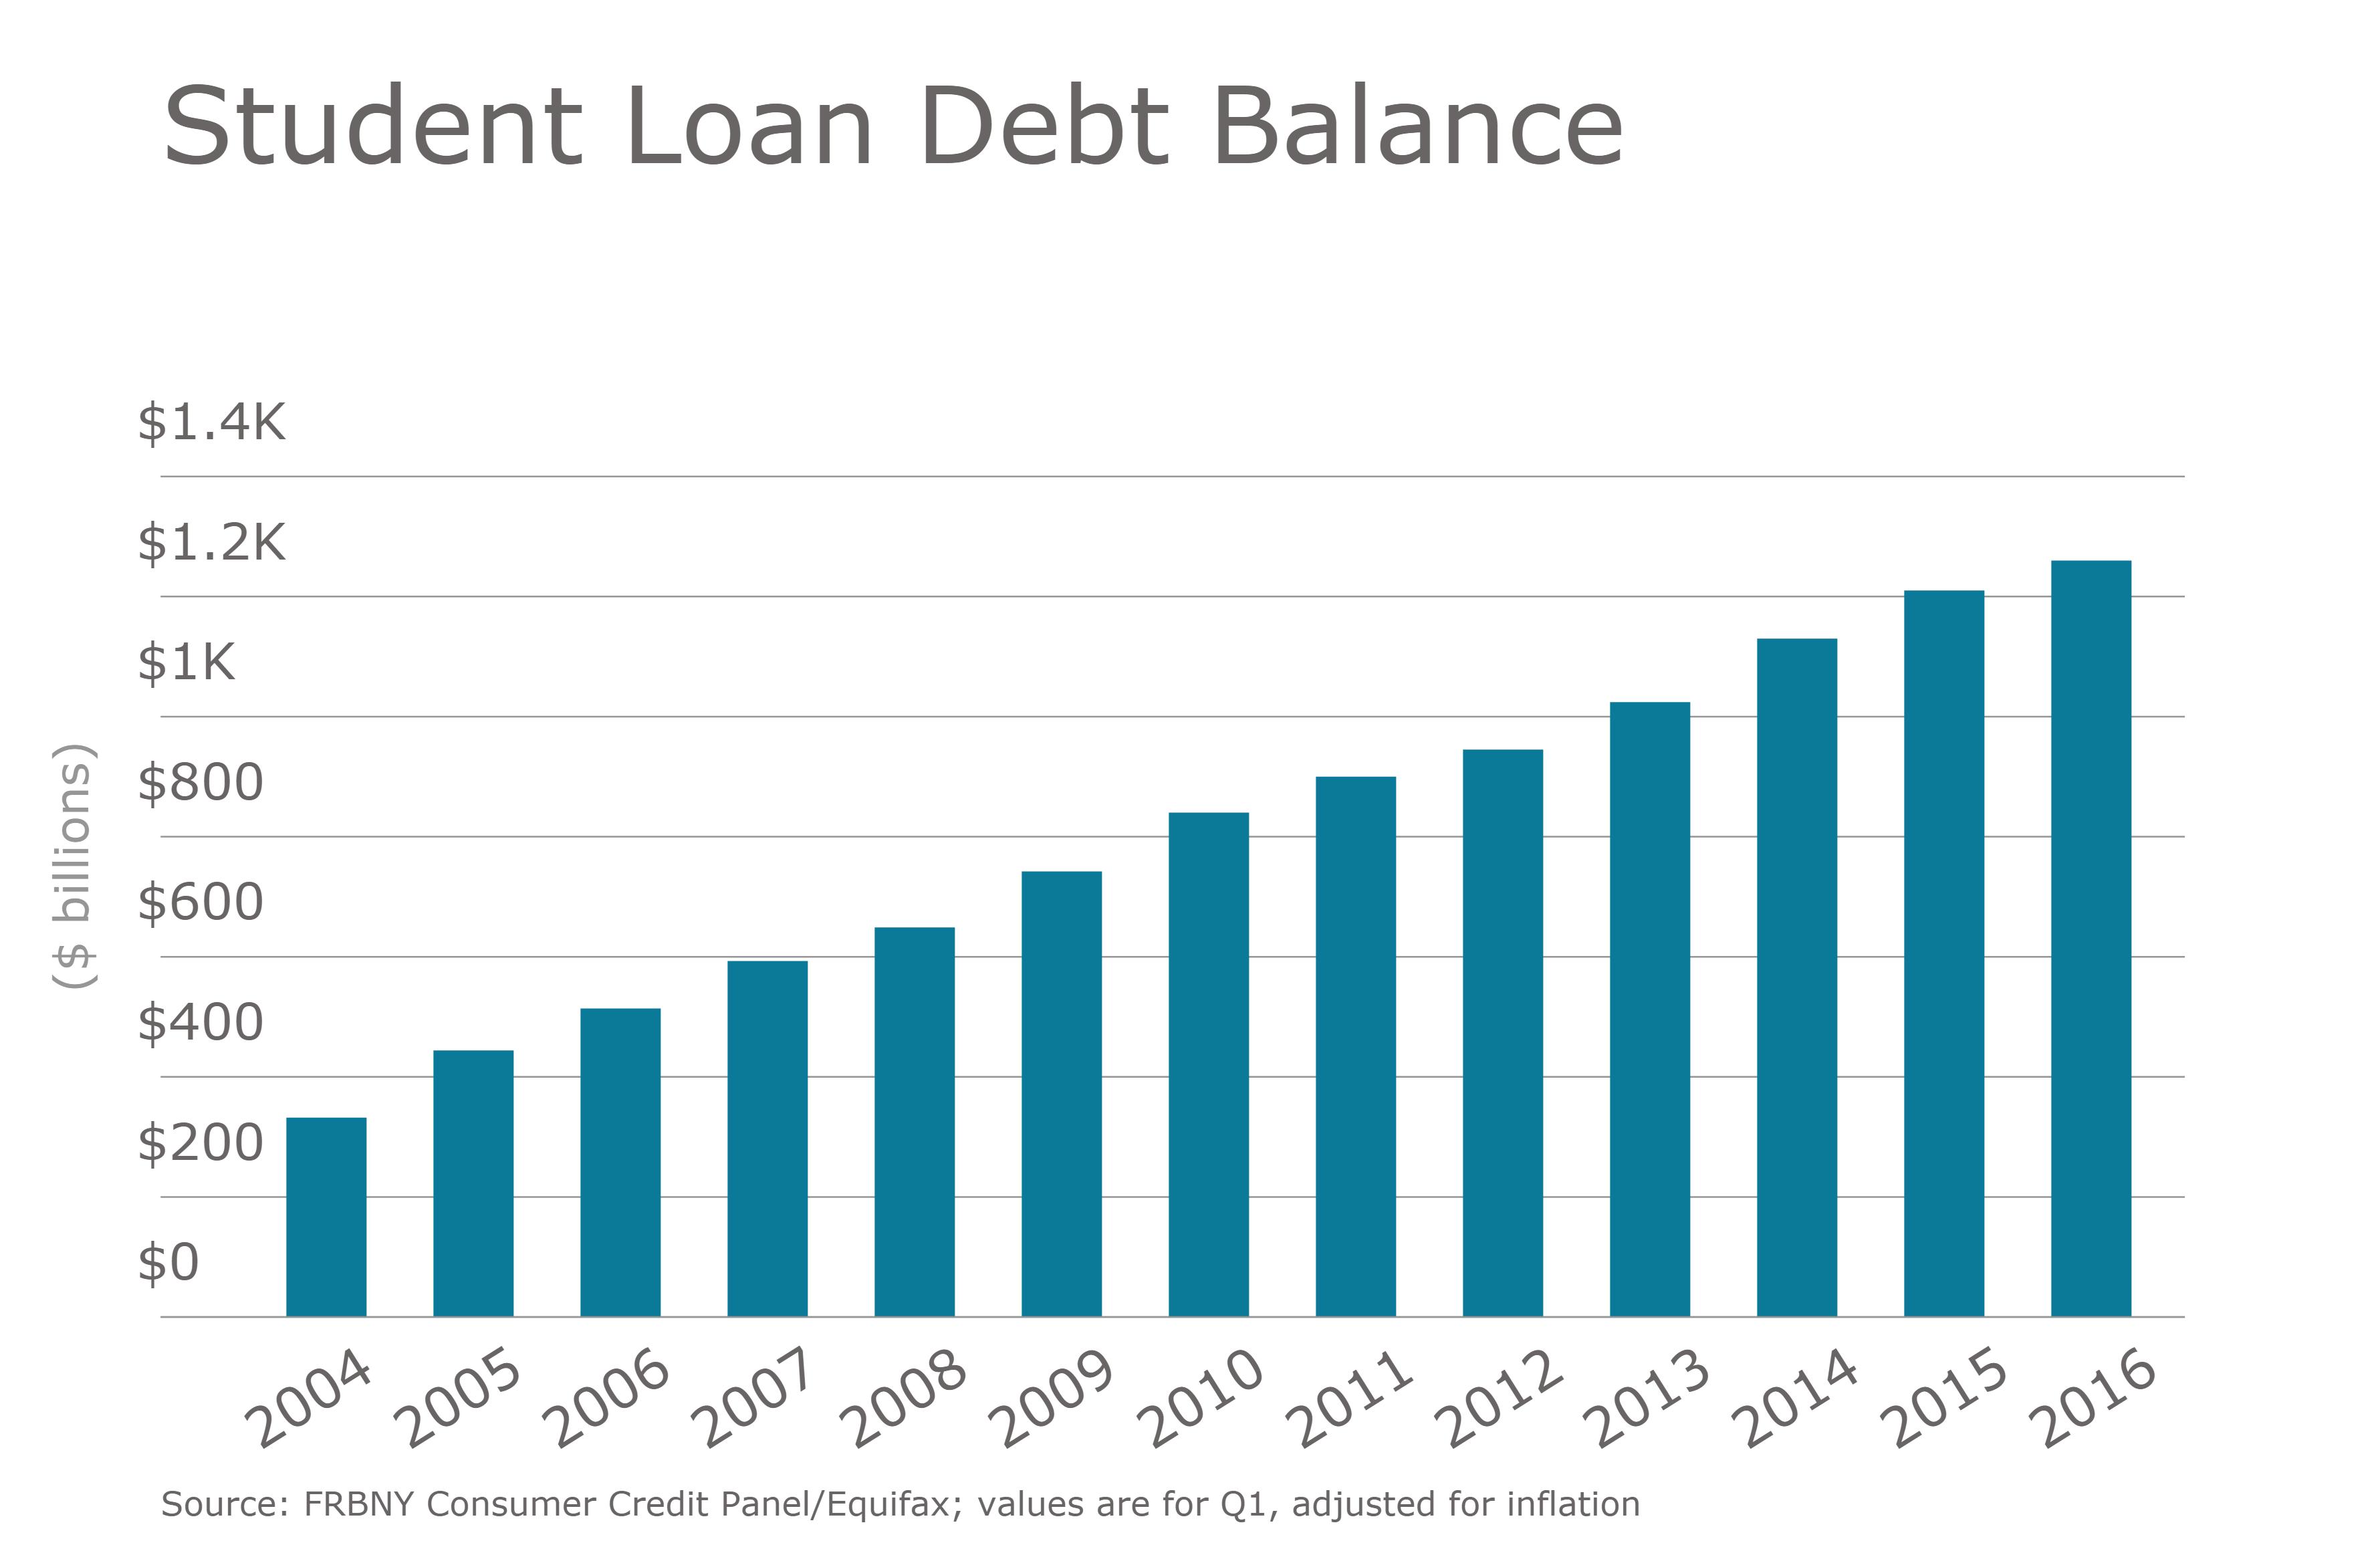 https://assets.sourcemedia.com/92/39/93bcfd9349b0bea6581f6116a5d6/ebn-student-loan-debt-balance.png